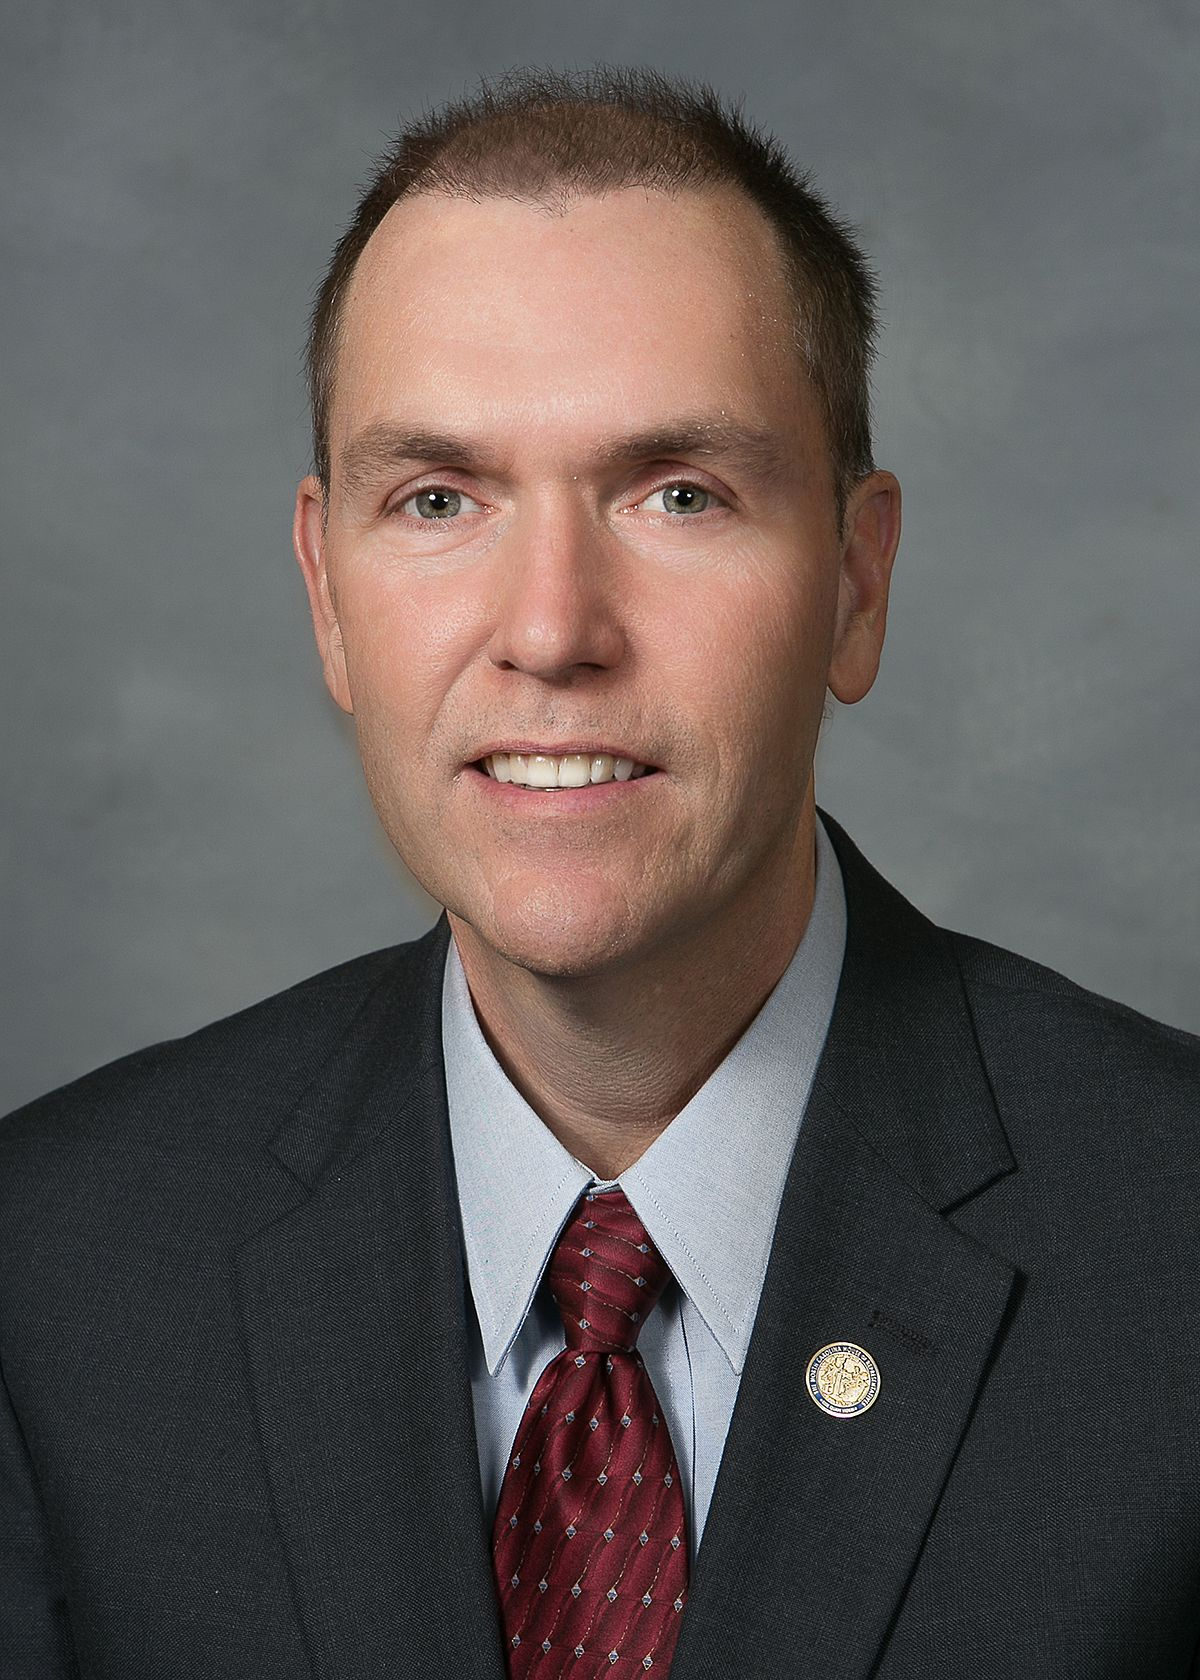 Bert Jones (politician) - Wikipedia